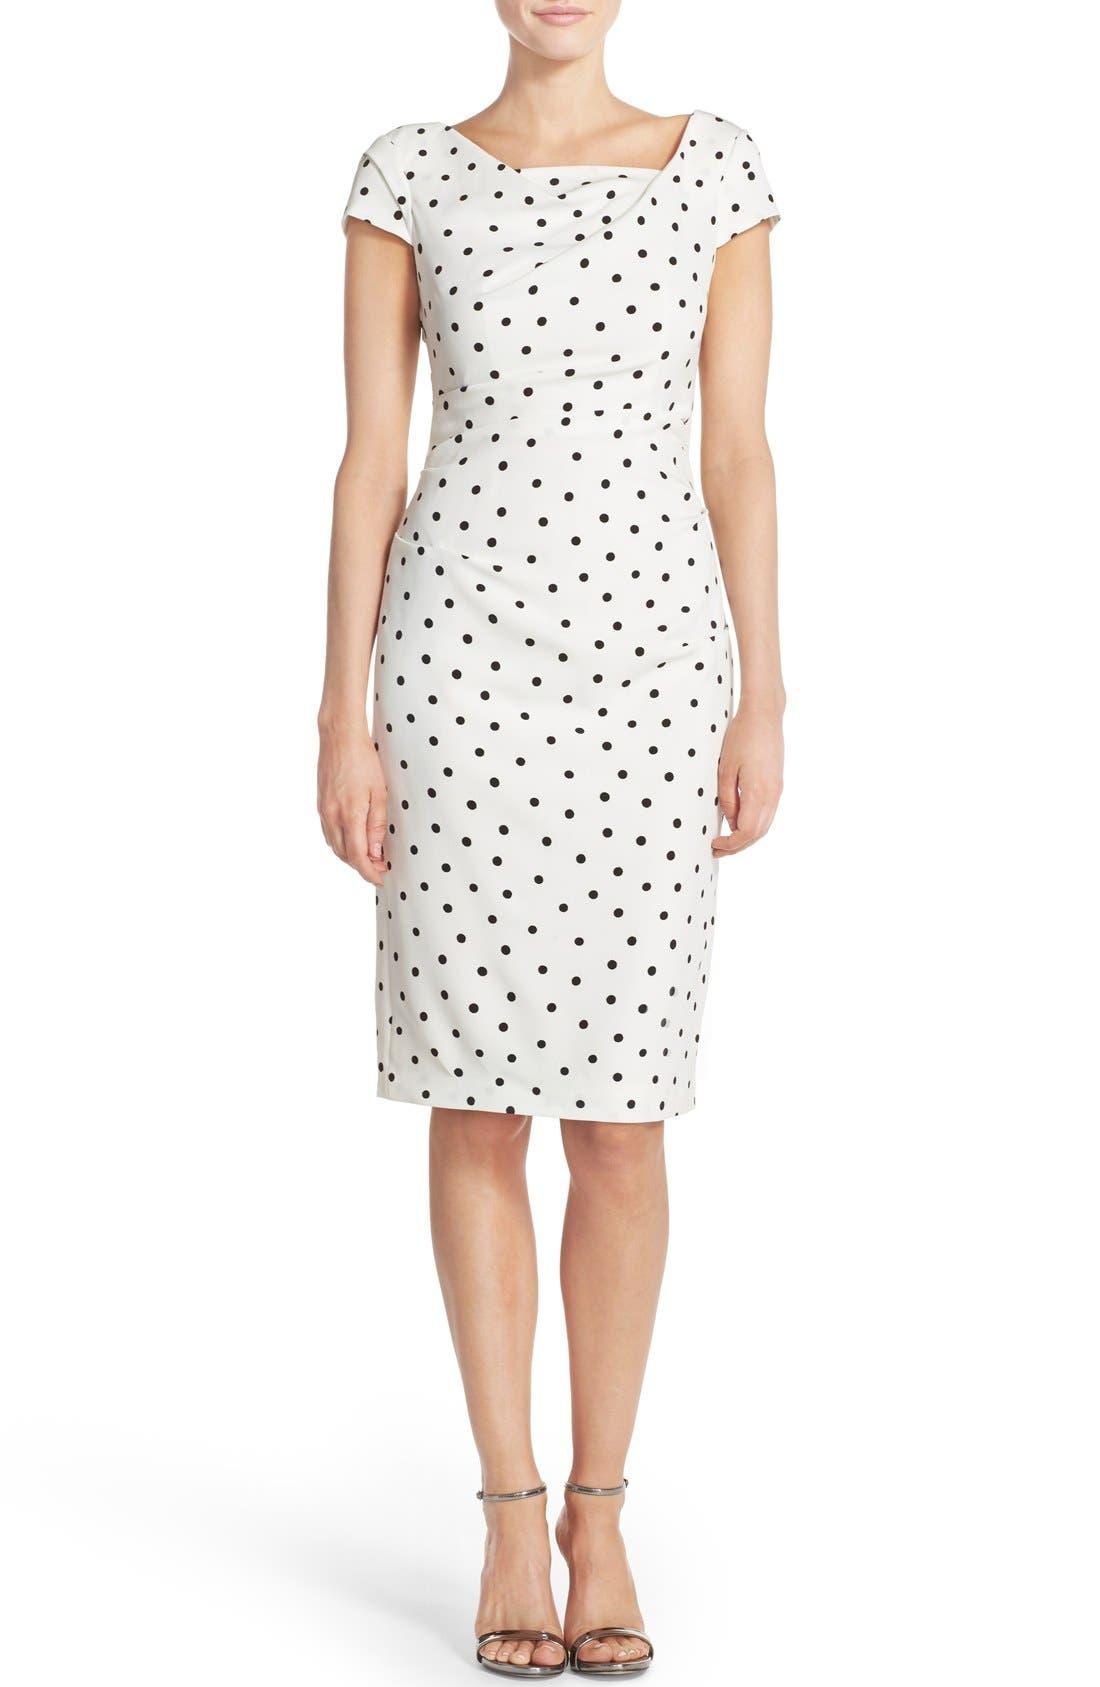 ADRIANNA PAPELL,                             Polka Dot Crepe Sheath Dress,                             Alternate thumbnail 6, color,                             900